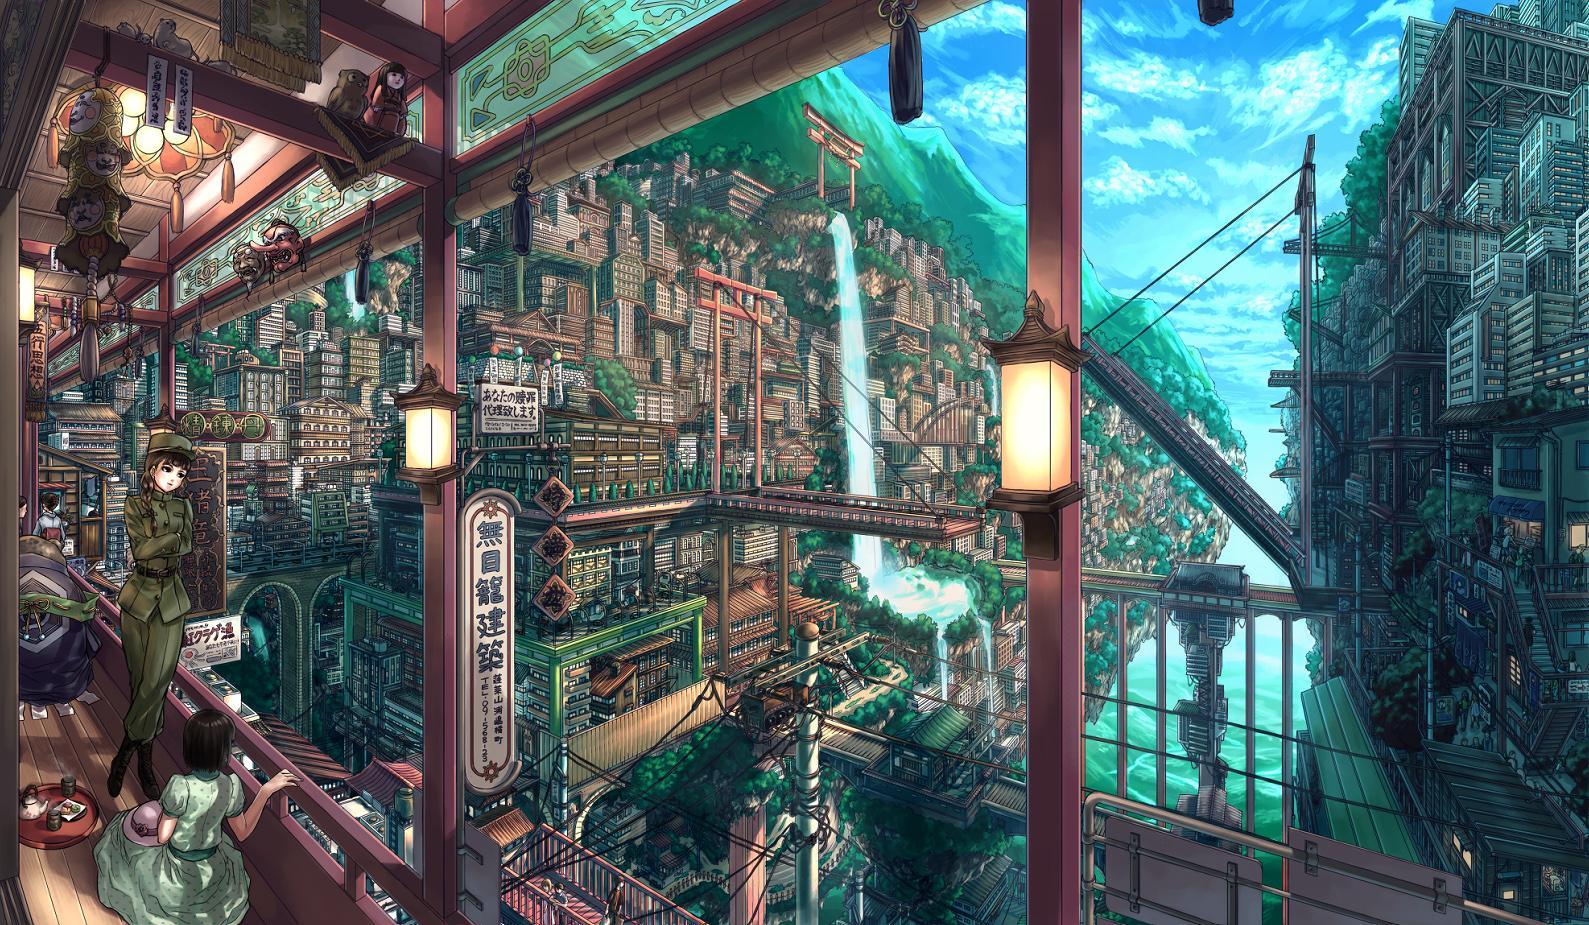 Beautiful Anime Wallpaper - Album on Imgur